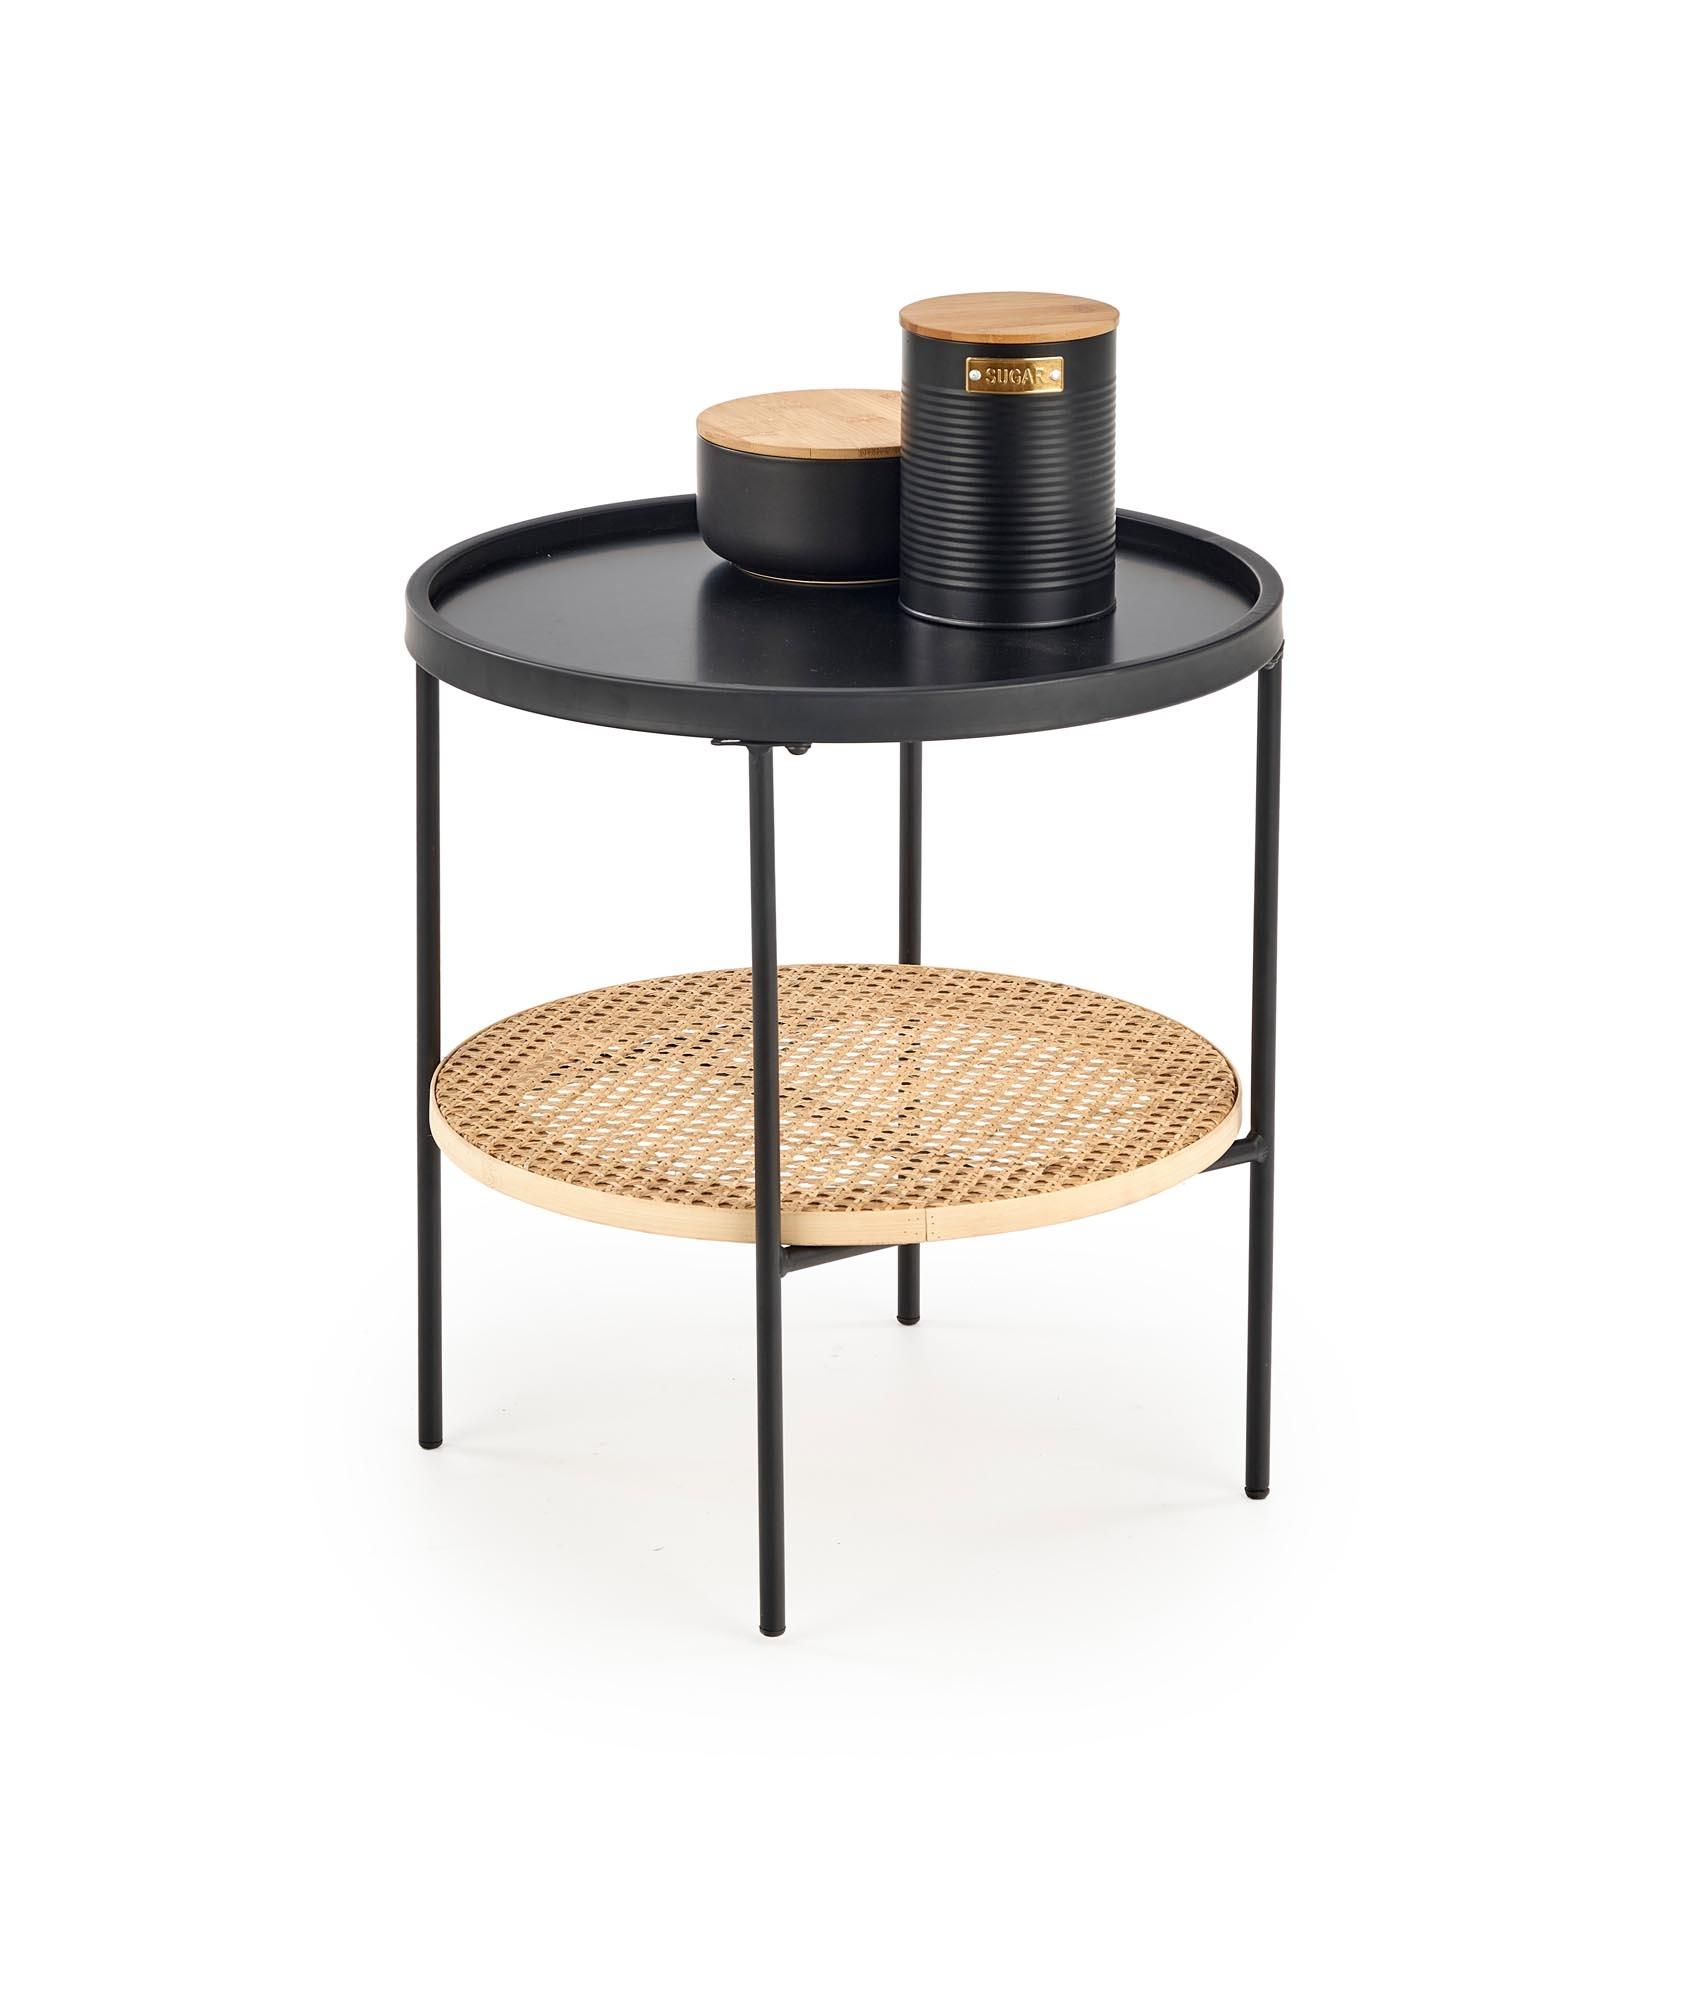 Masa de cafea din MDF, ratan si metal Kampa Natural / Negru, Ø45xH45 cm poza